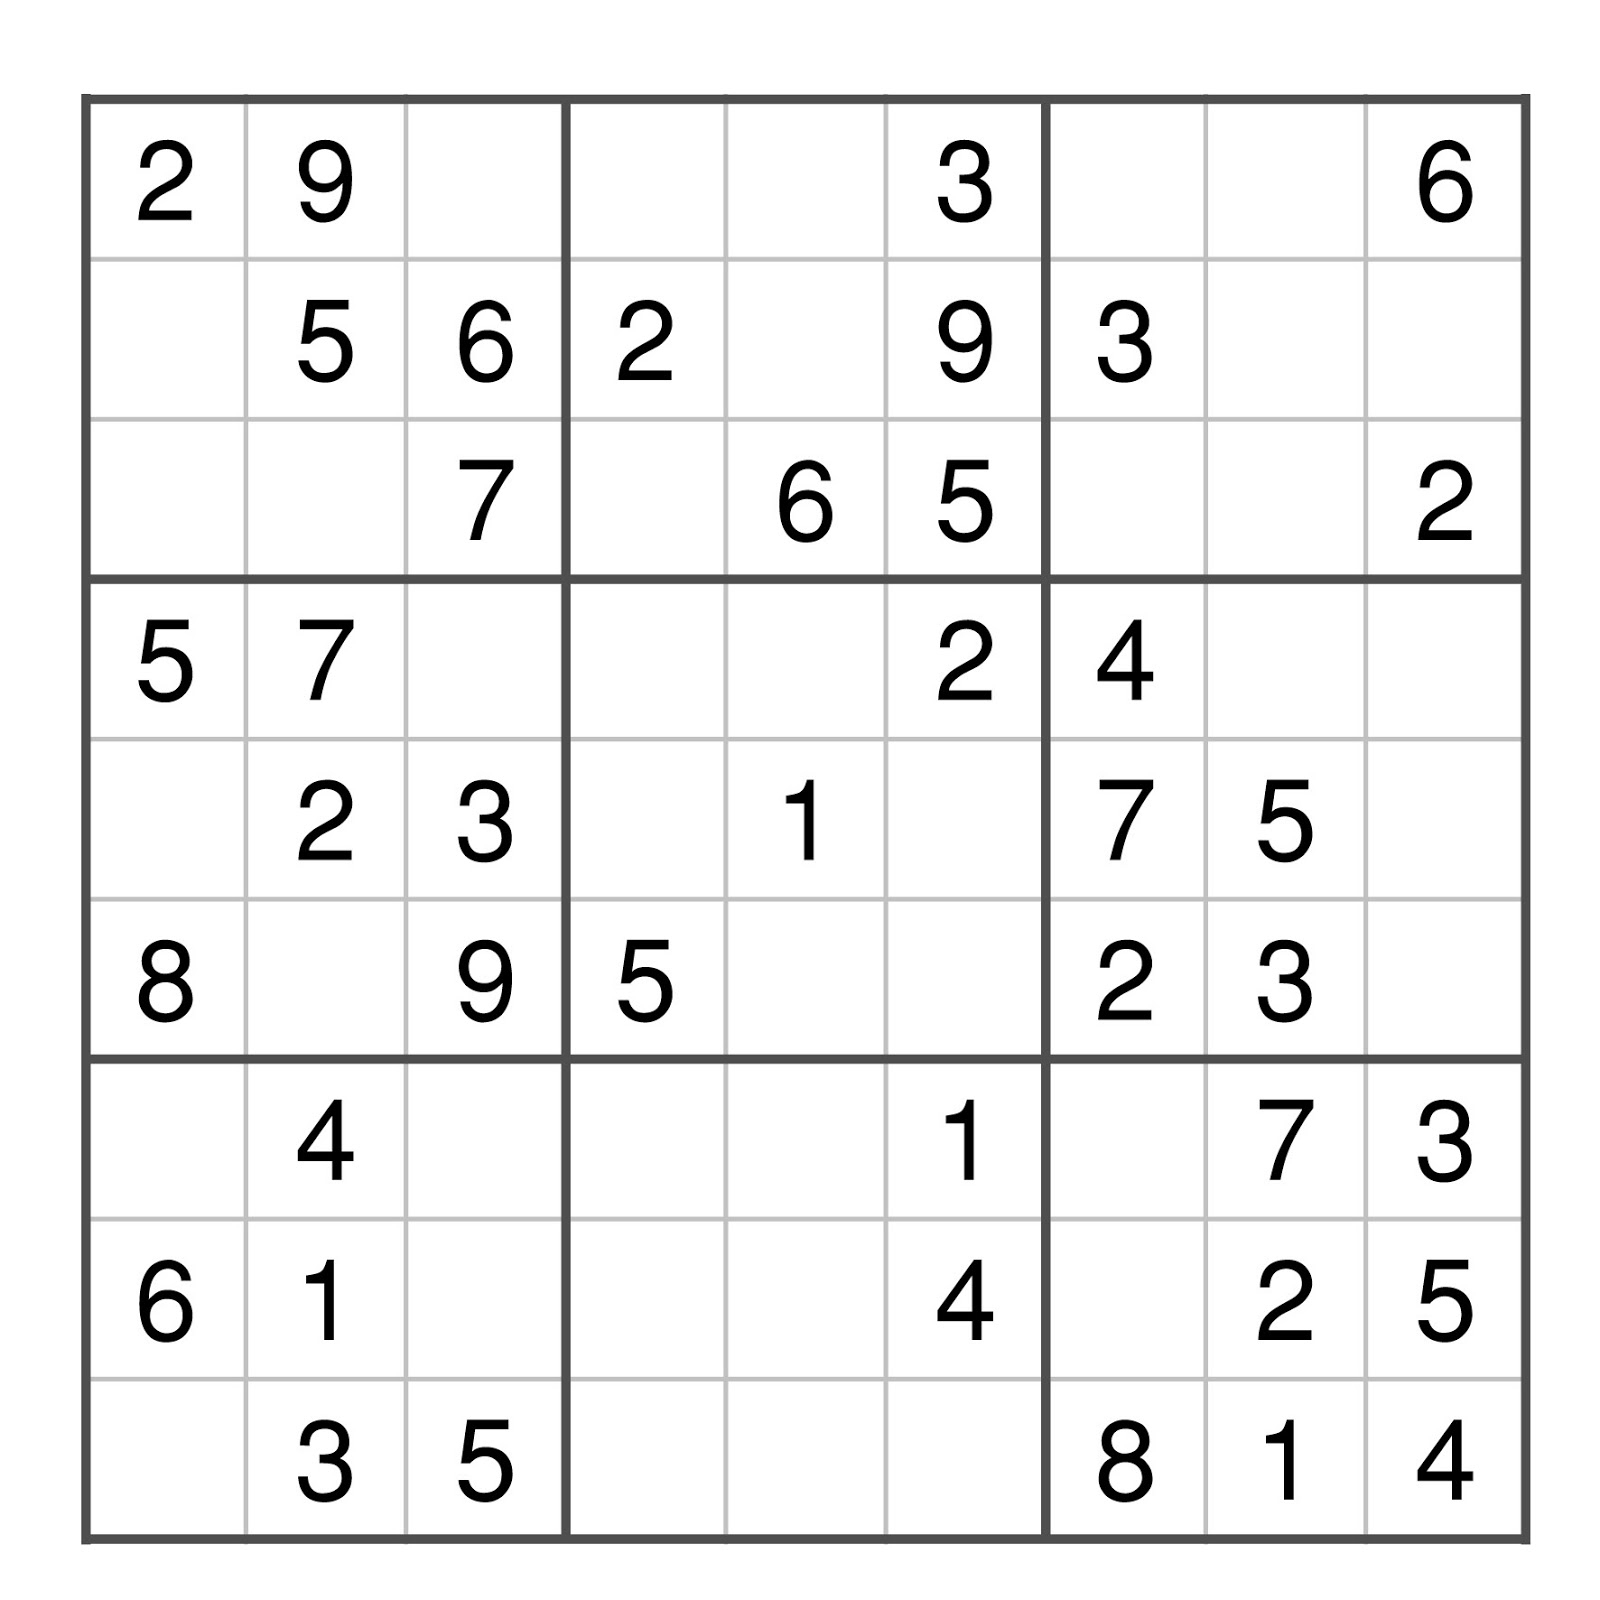 Ad@jmedia (Apei-Jeux): Sudoku Facile N°4 pour Jeux Sudoku À Imprimer